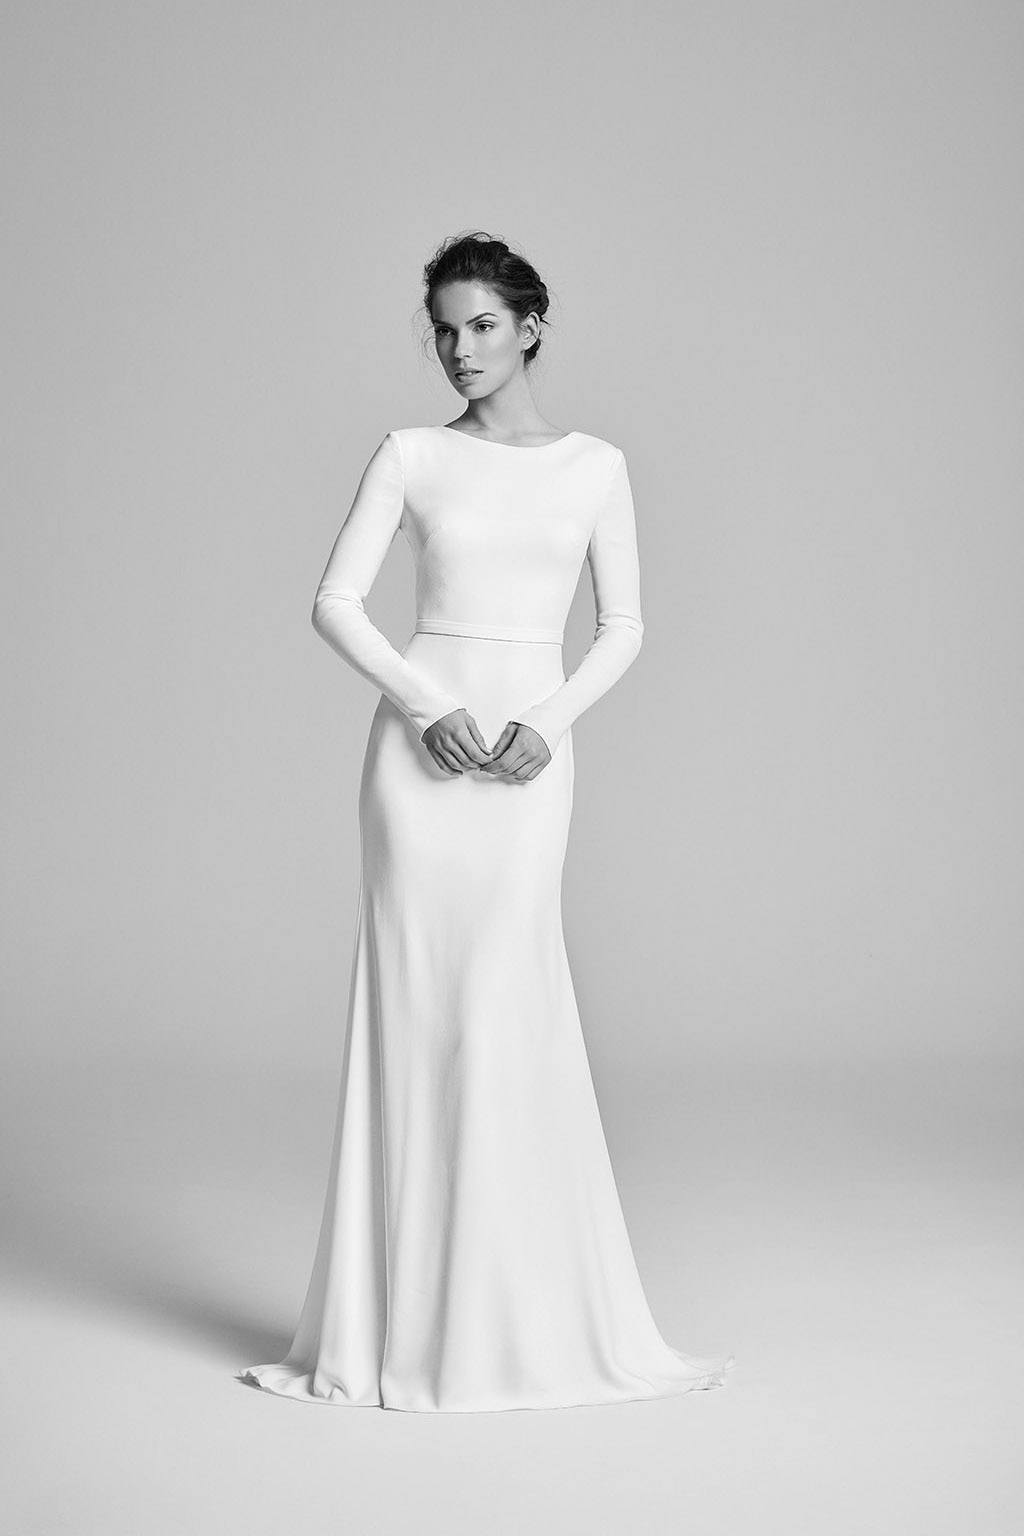 geddess-bridalcouture-wedding-dresses-uk-belle-epoque-collection-2018-by-designer-suzanne-neville